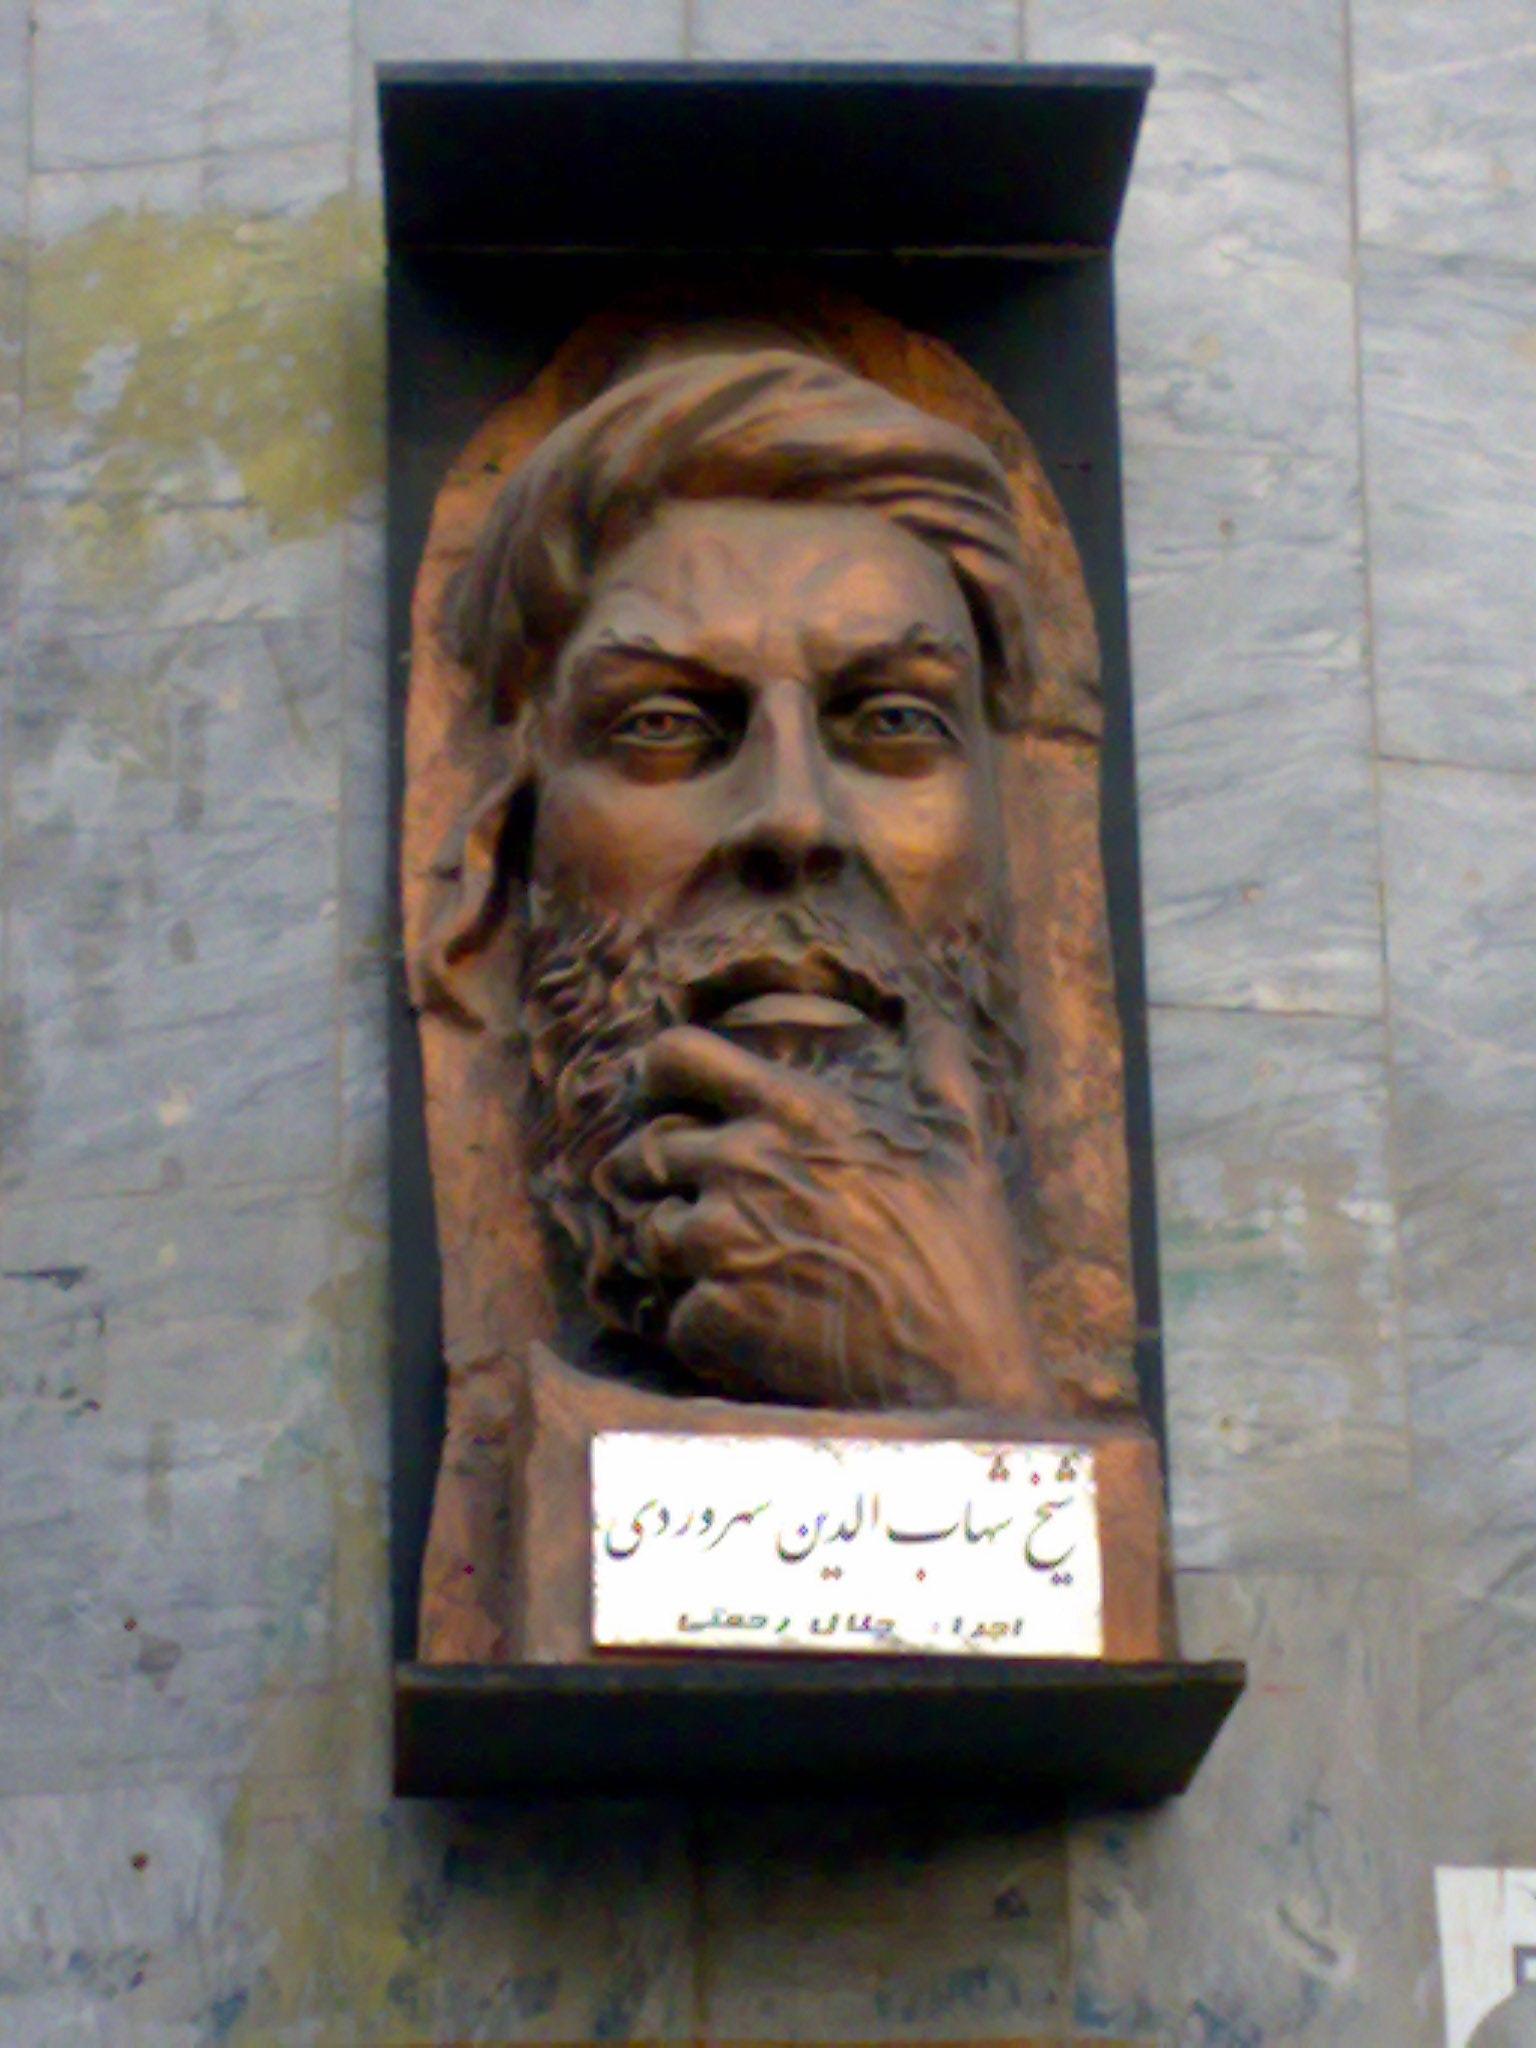 Bust_Persian_Scholar_Philosopher_Sufi_Sheikh_Shahbeddin_Sohrevardi